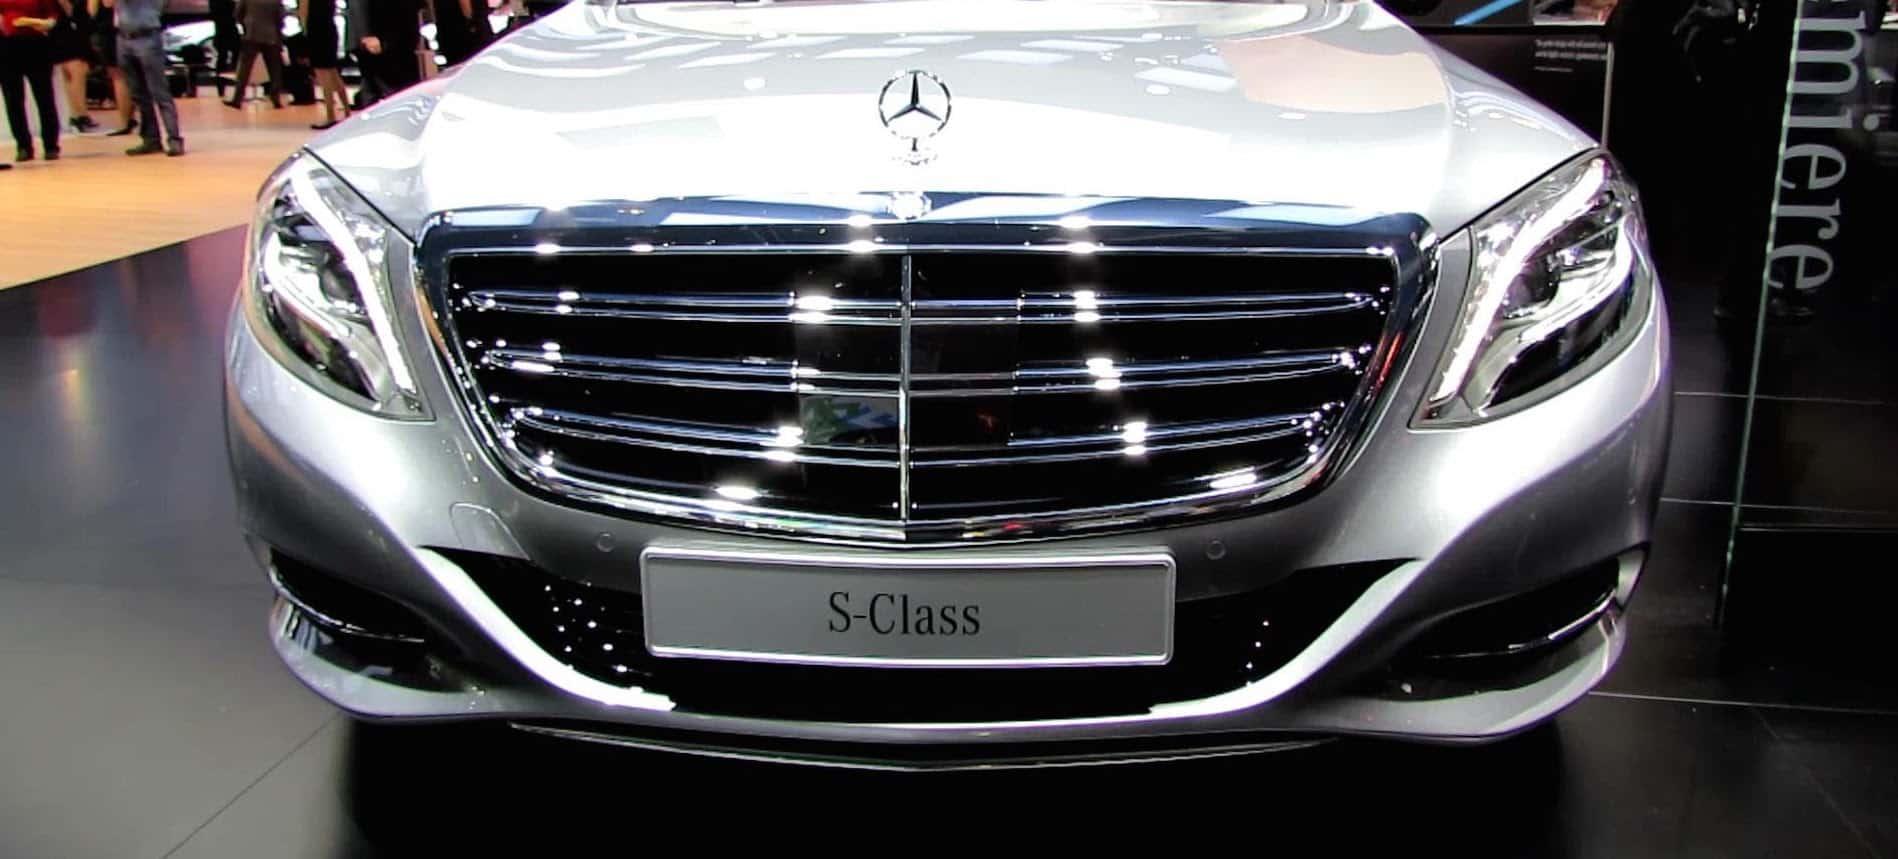 S-Class 2015